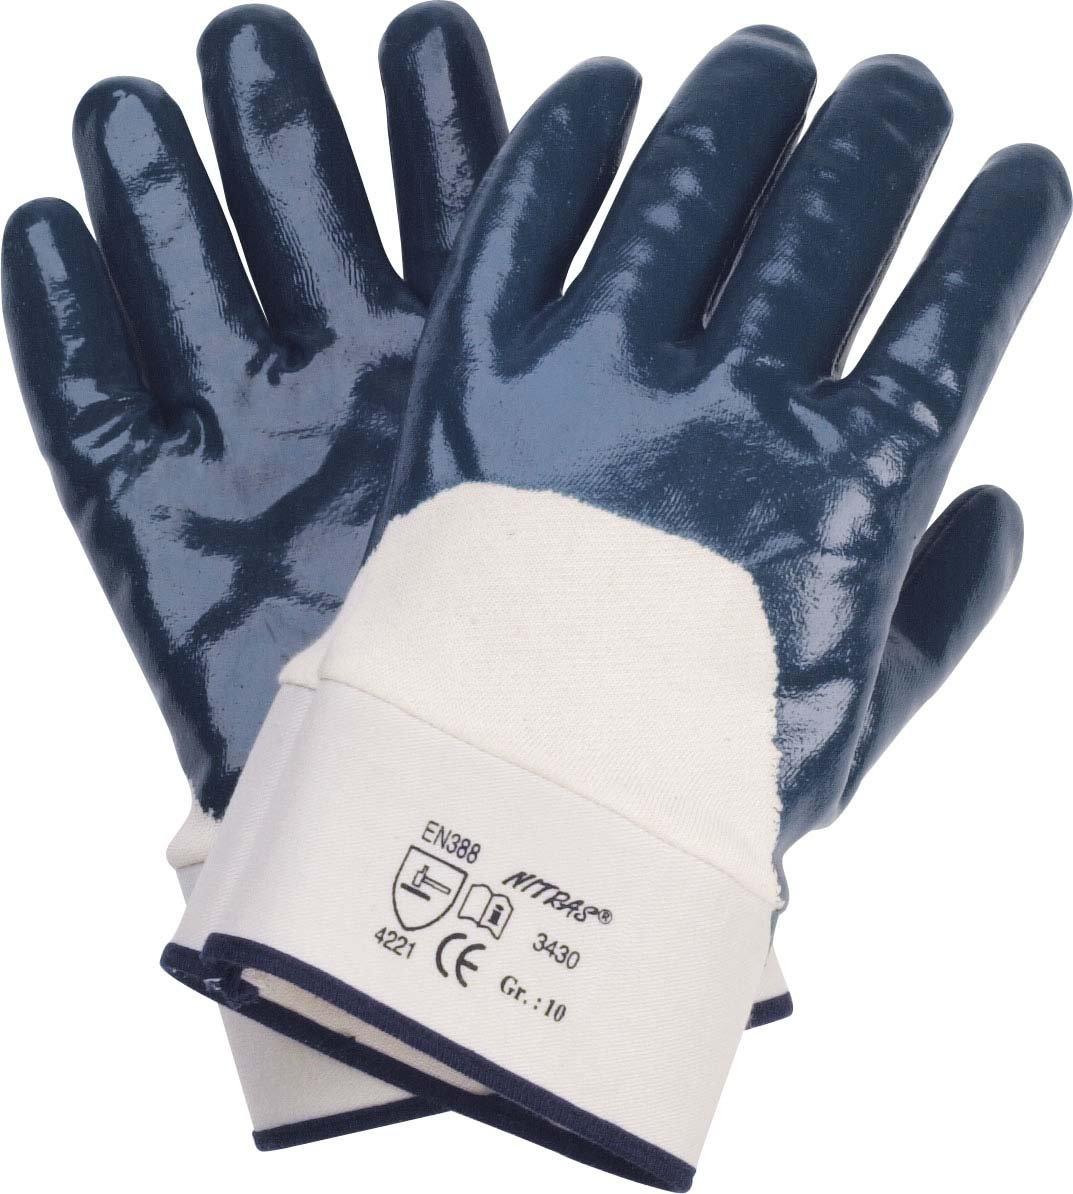 144 Paar Nitril-Handschuhe / Arbeitshandschuhe Nitril/Segeltuch-Stulpe, teilbesch. blau, Gr. 10, EN 388 KAT.2 Hembeck